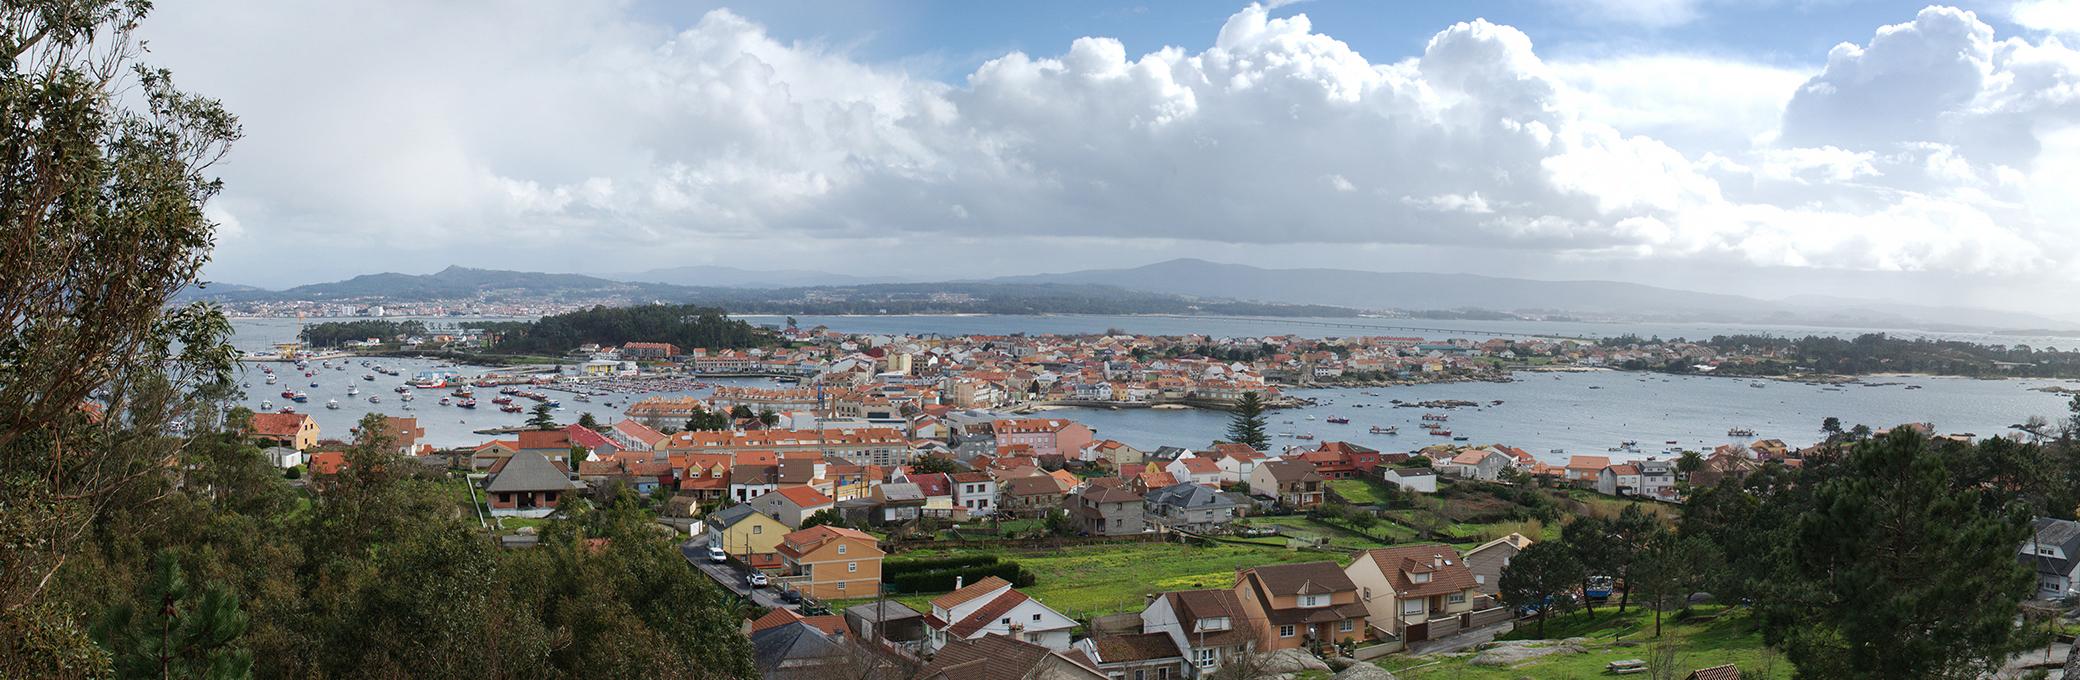 Panoramica Isla de Arosa Galicia 2080x680